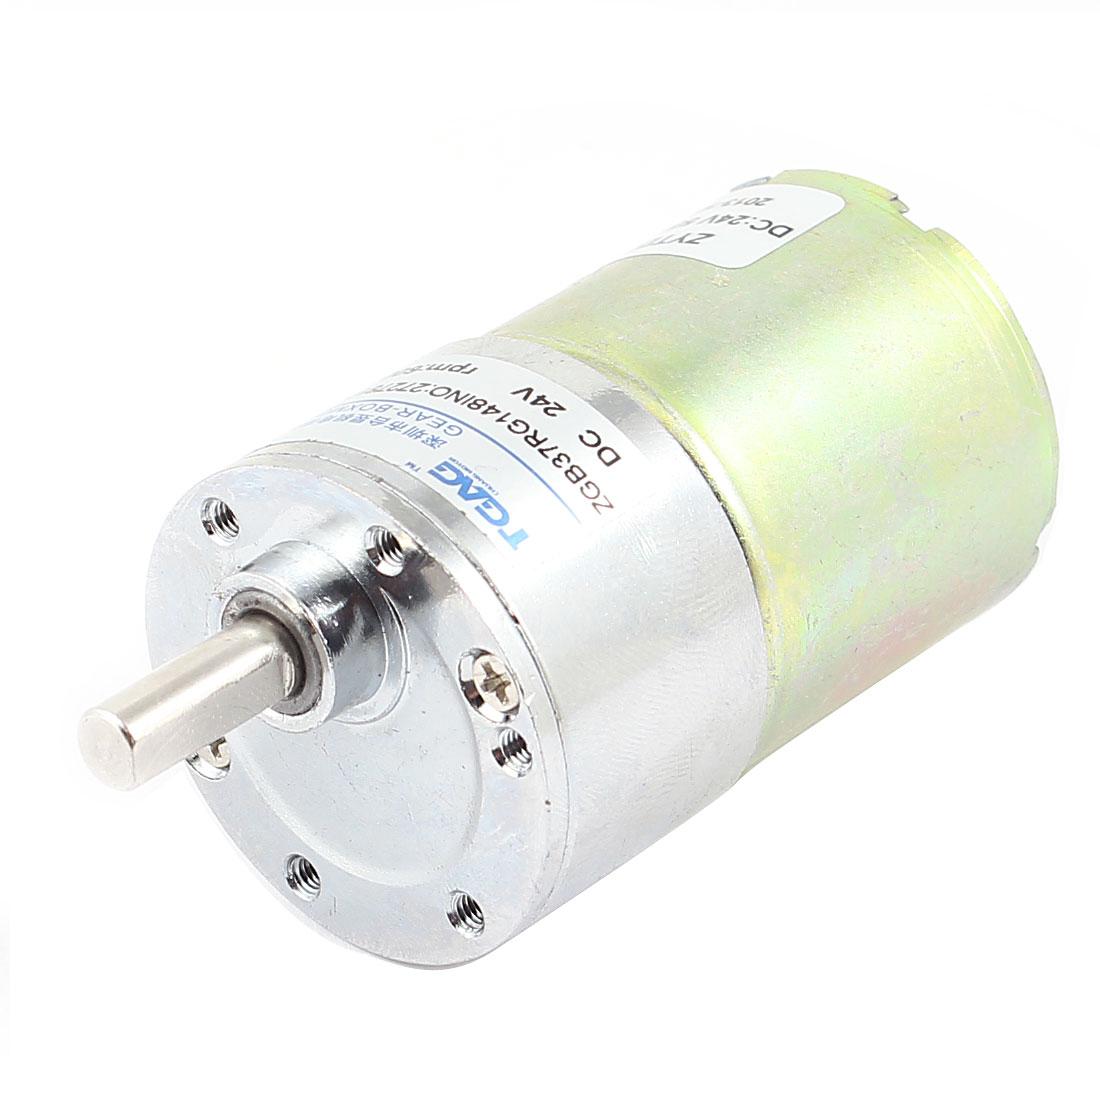 DC 24V 0.33A 8.6kg.cm Torque 37mm Dia Magnetic DC Gear Box Motor 600 RPM